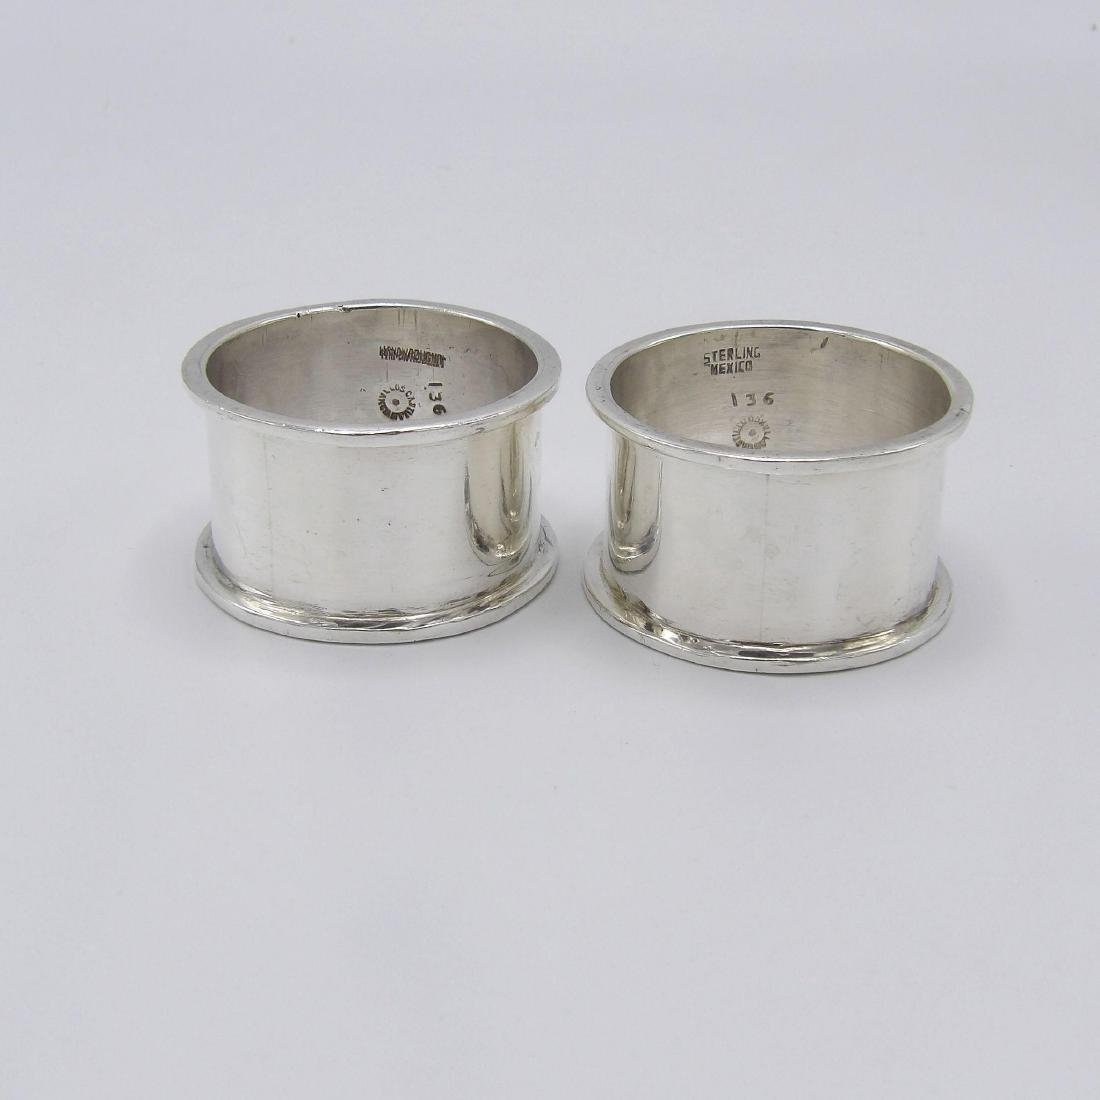 Vintage Taxco Sterling Silver Castillo Bro Napkin Rings